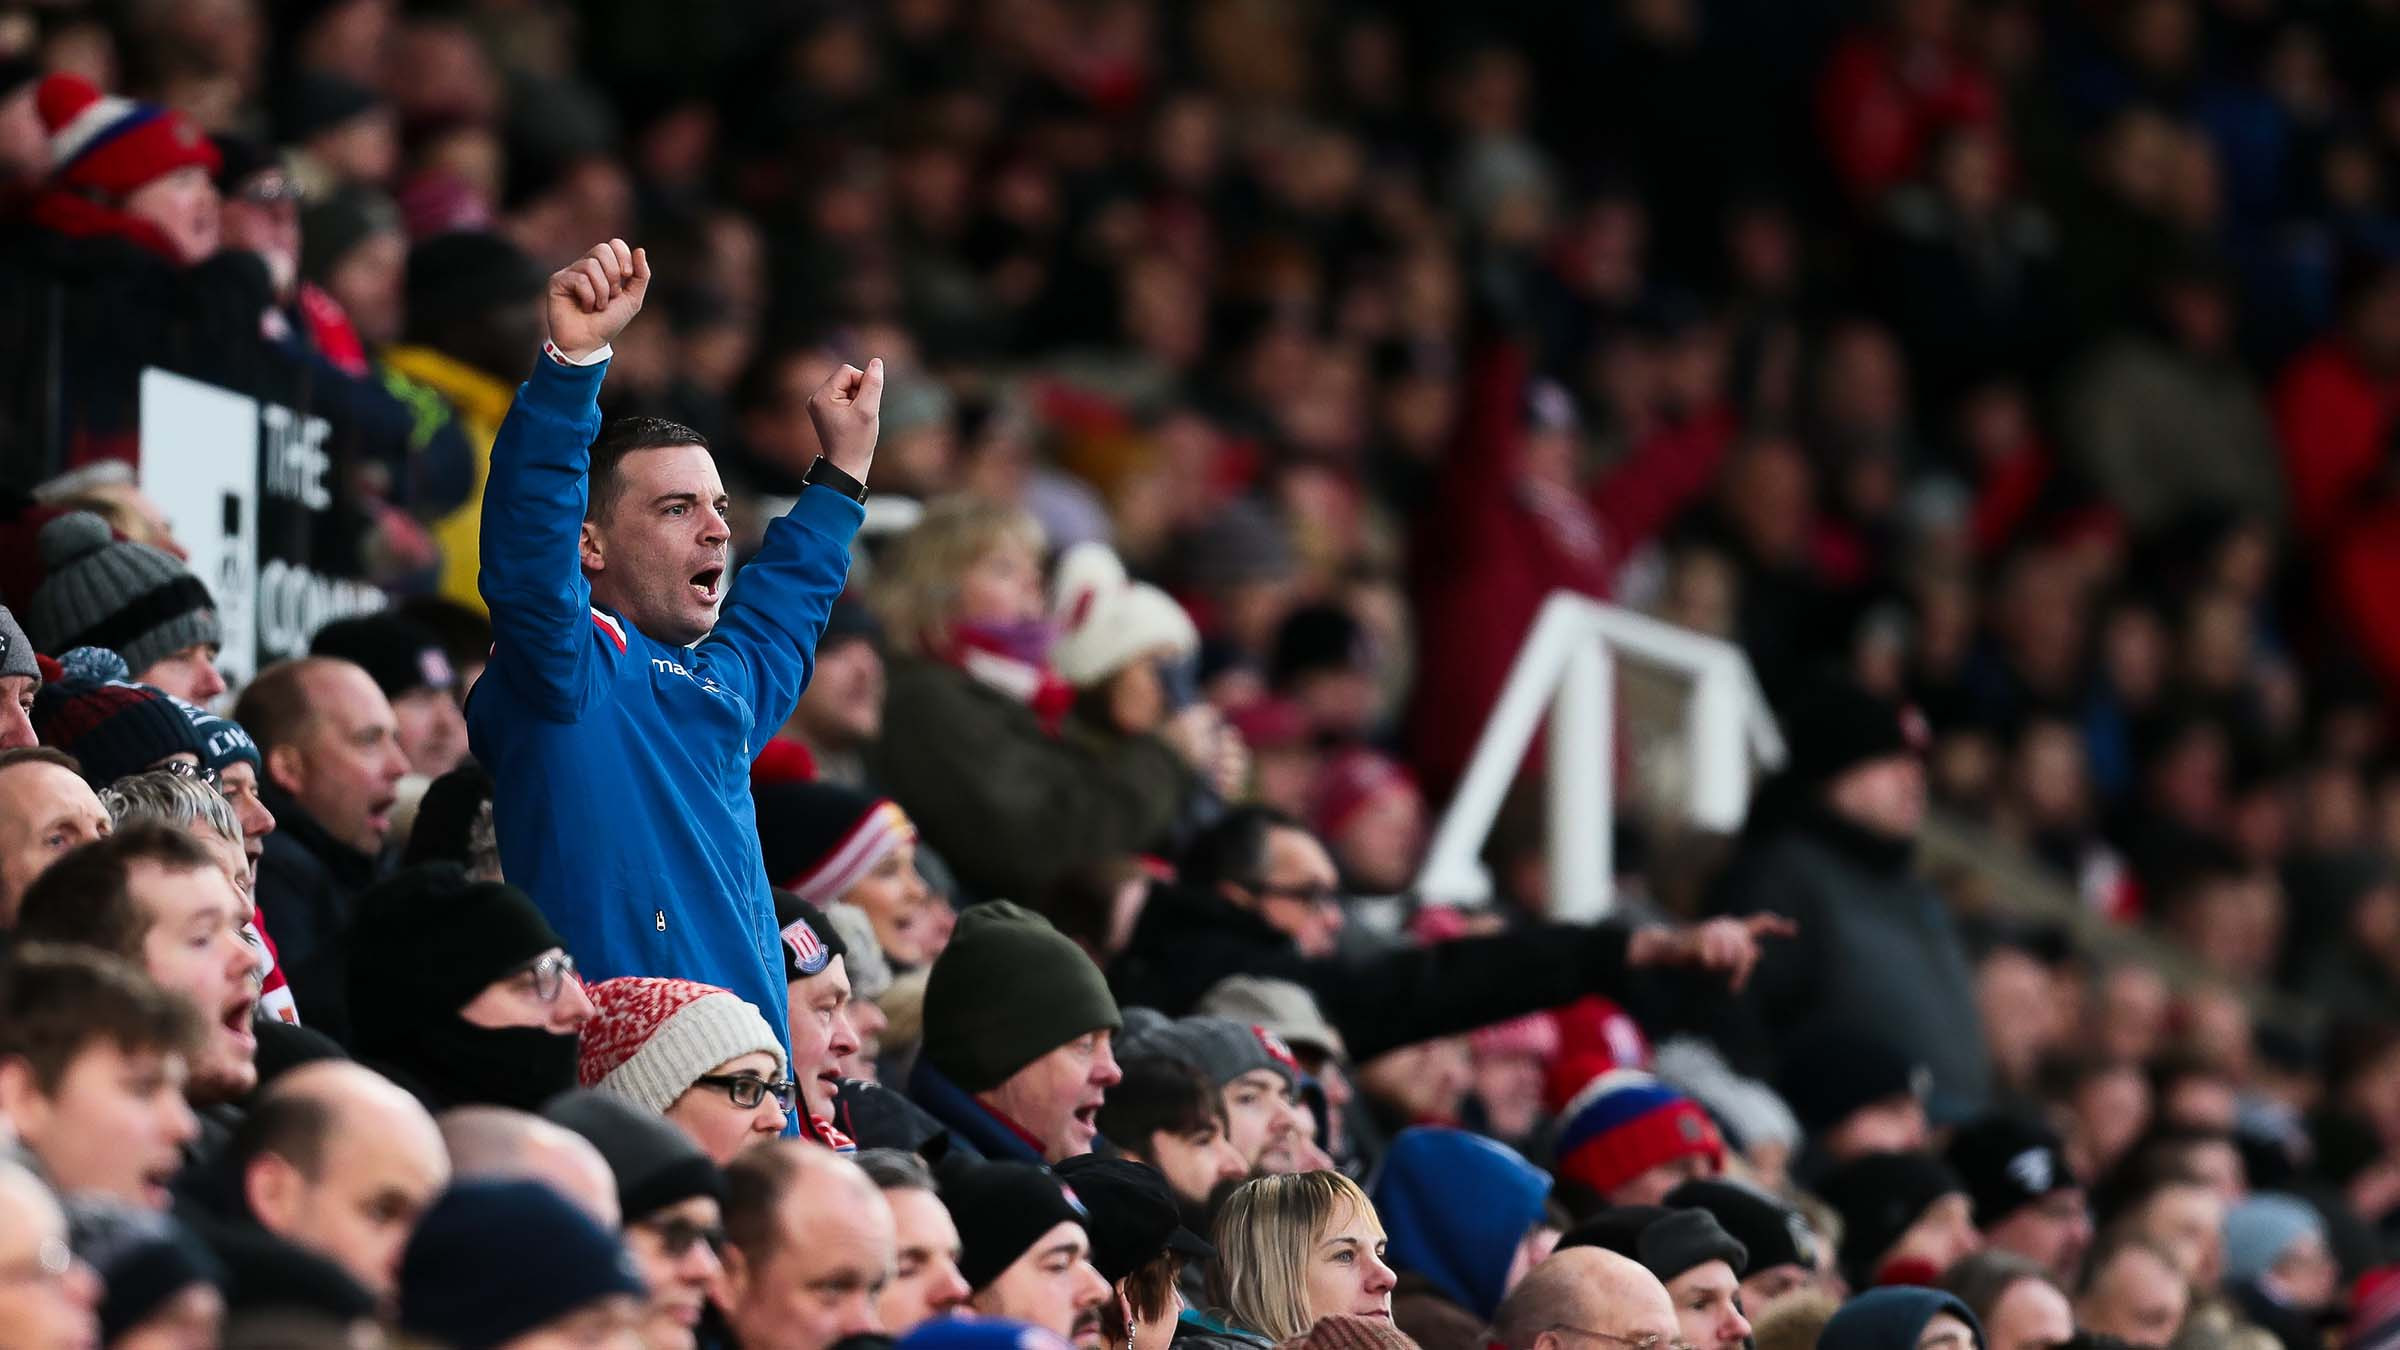 Supporters - 169 - 2400x1350 - Huddersfield Town.jpg